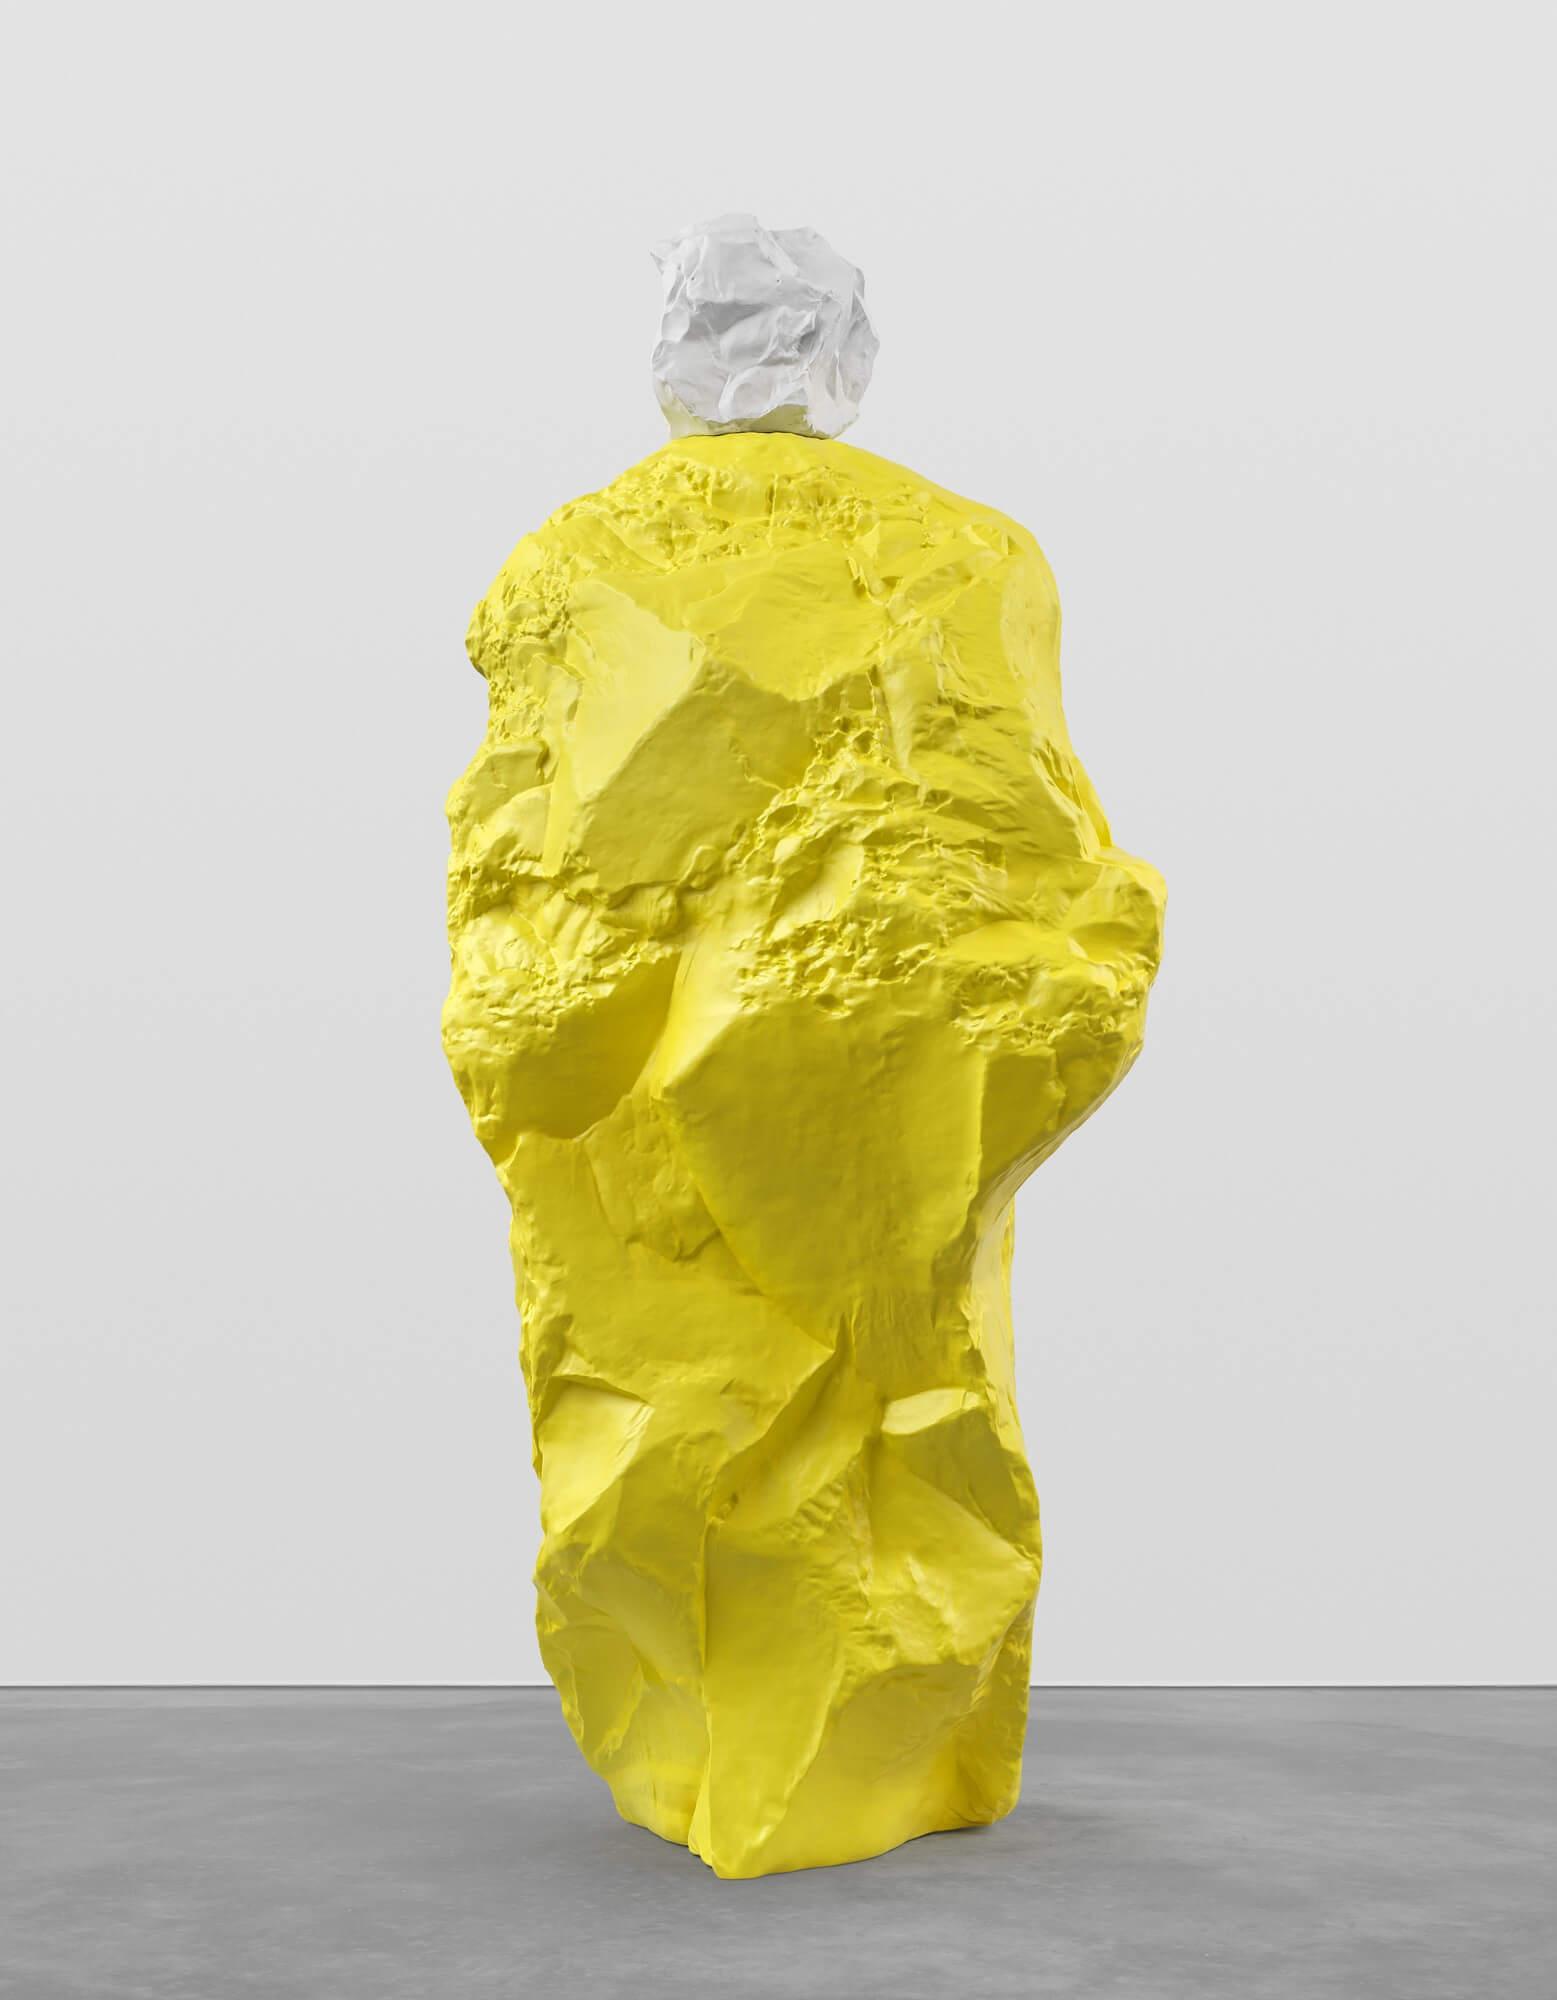 white yellow monk | UGO RONDINONE